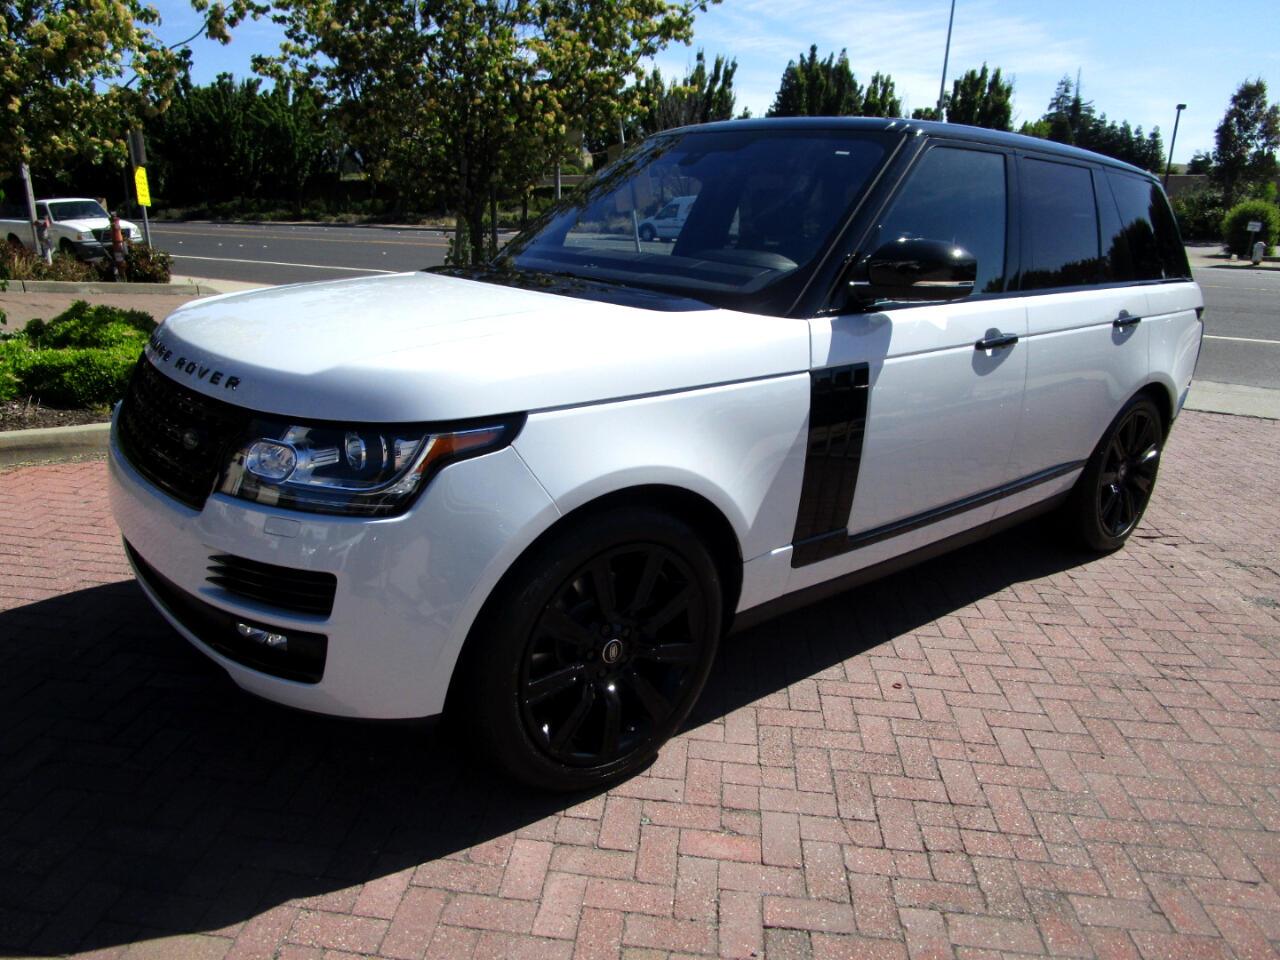 2016 Land Rover Range Rover HSE DIESEL**VELAR BLK TRIM PKG*HEAT-AC SEATS**PANO